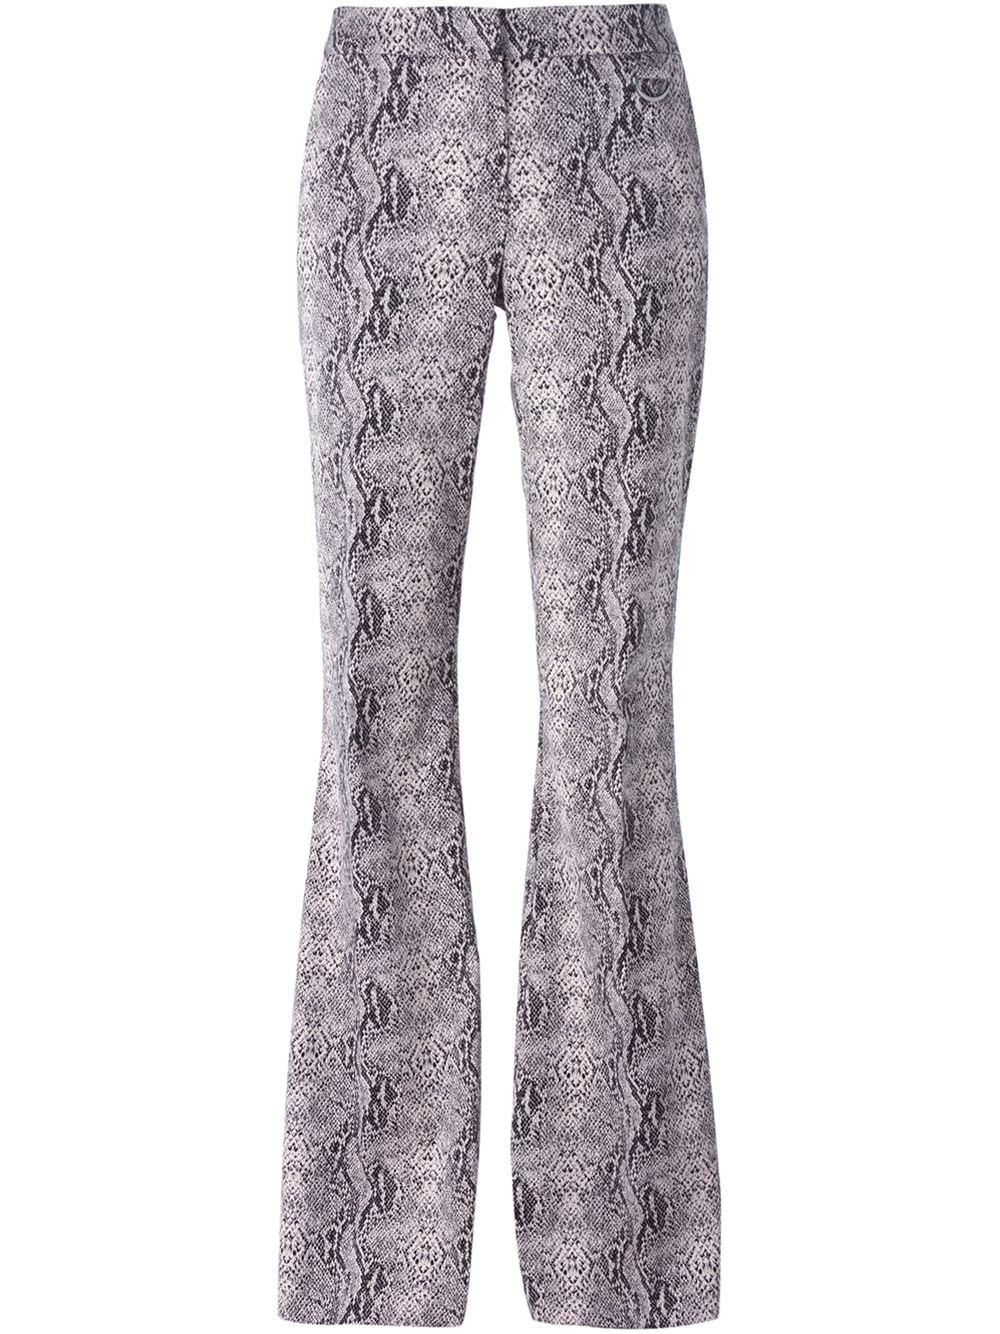 d0e258884e Giamba Pink Snakeskin Print Flared Trousers